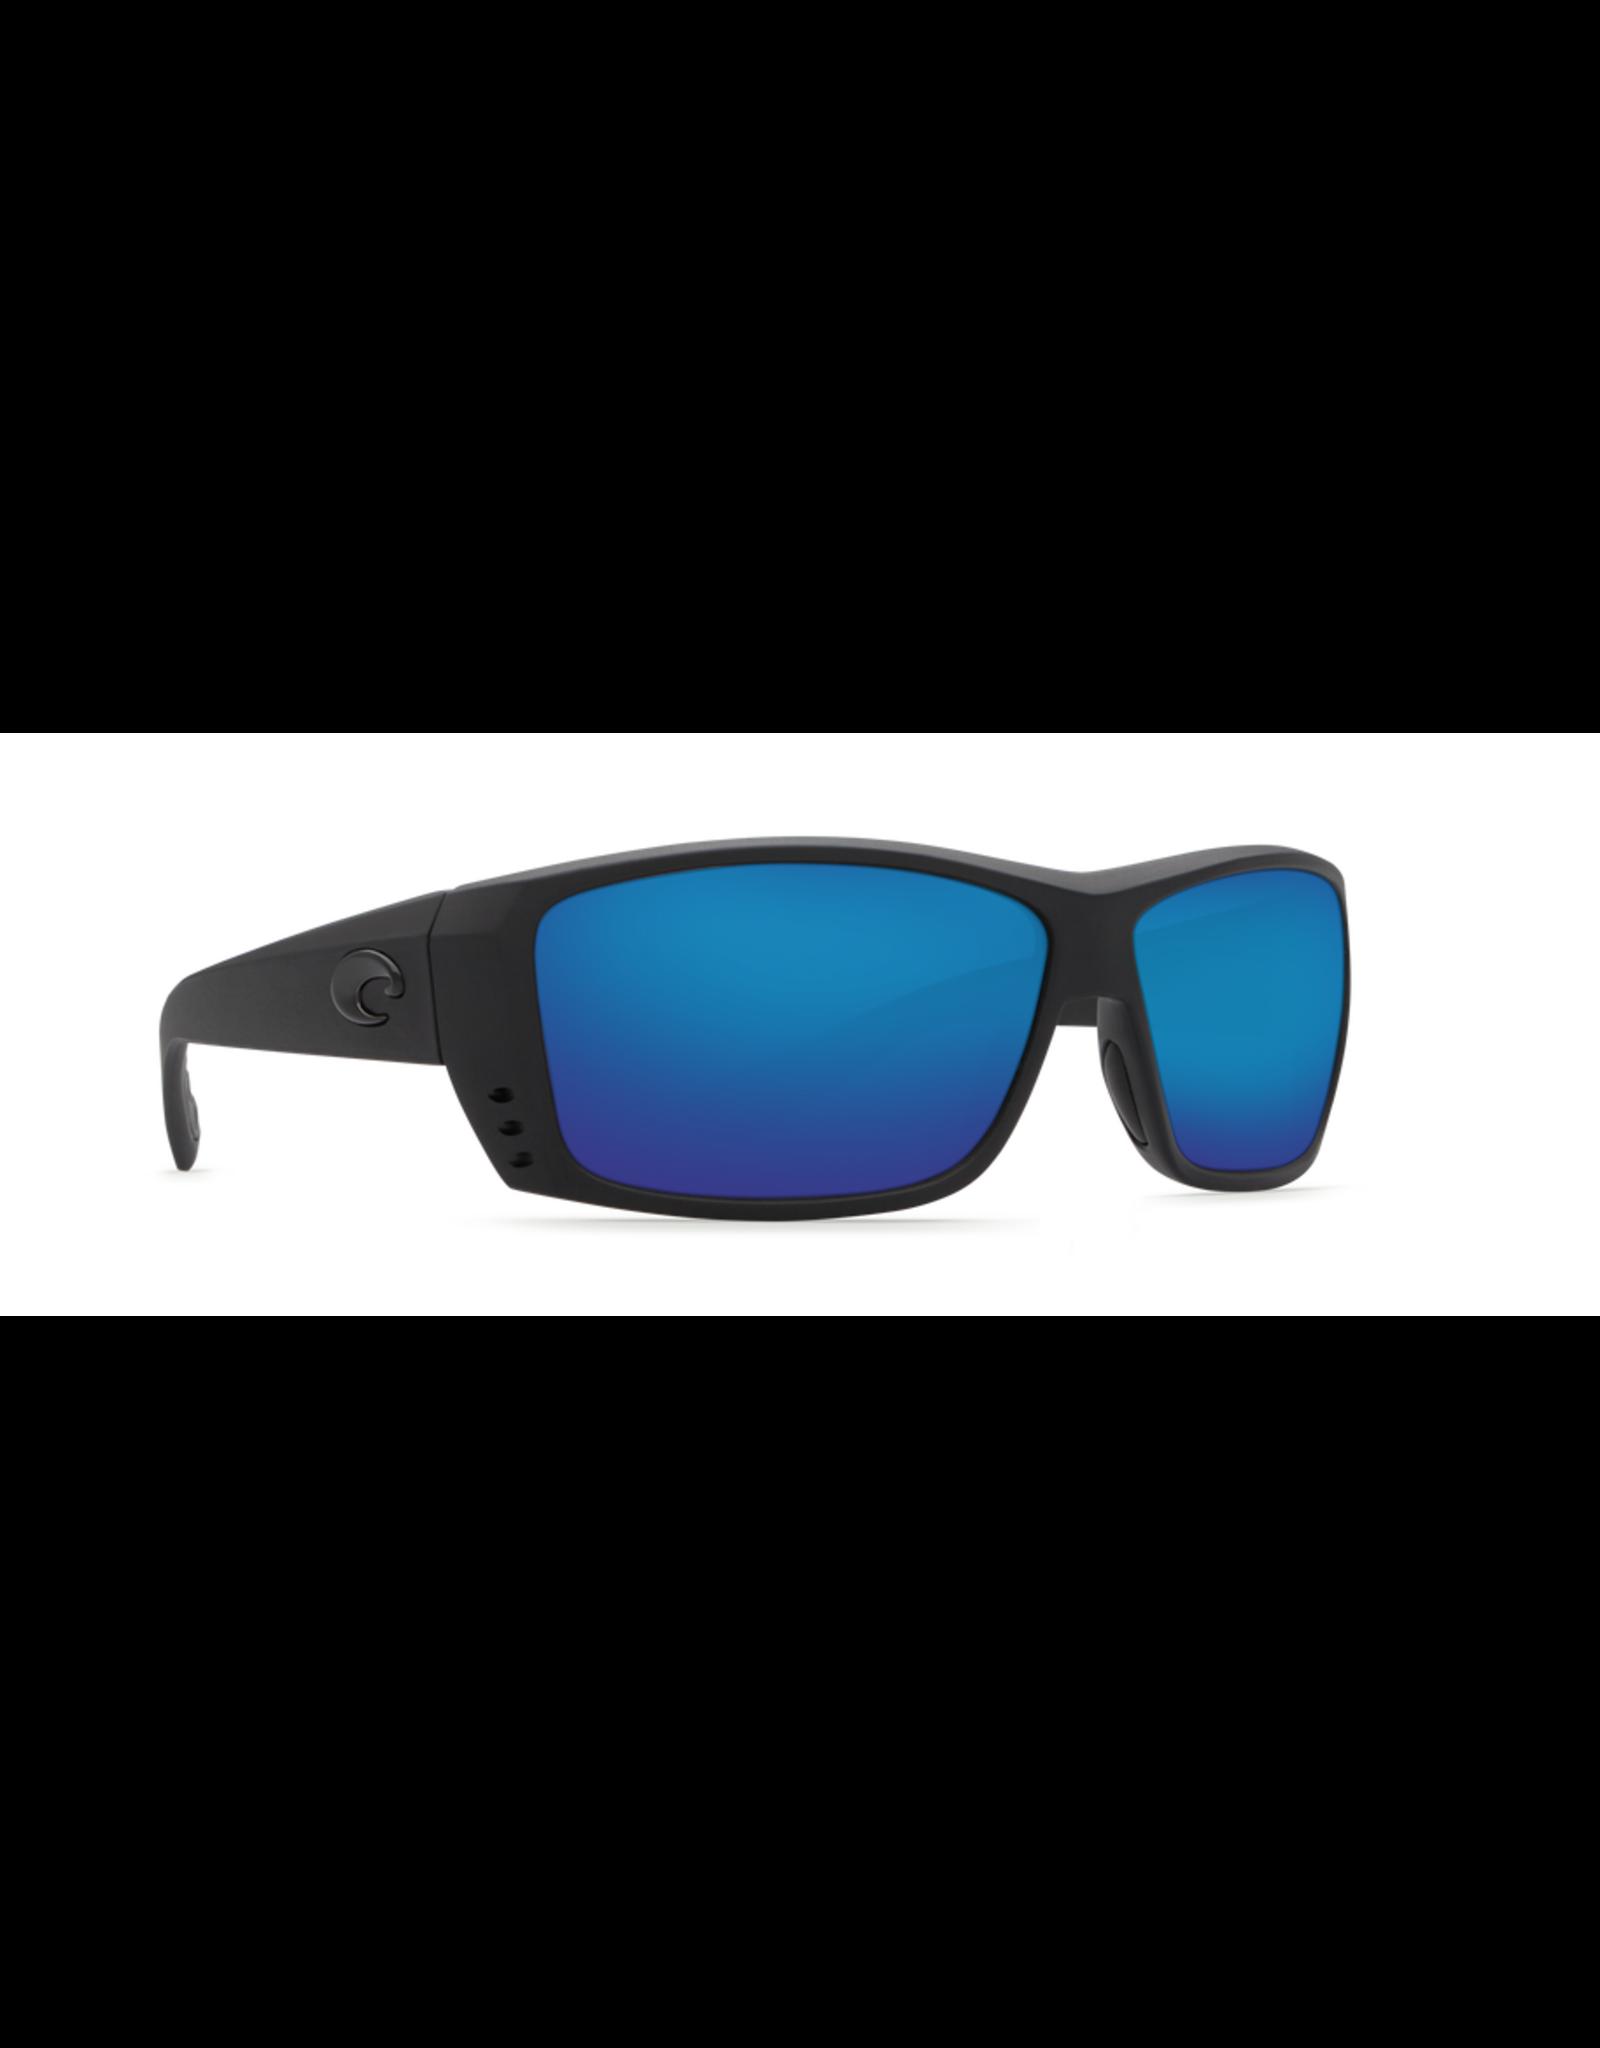 COSTA DEL MAR CAT CAY 01 BLACKOUT W/ GRAY BLUE MIRROR 580P